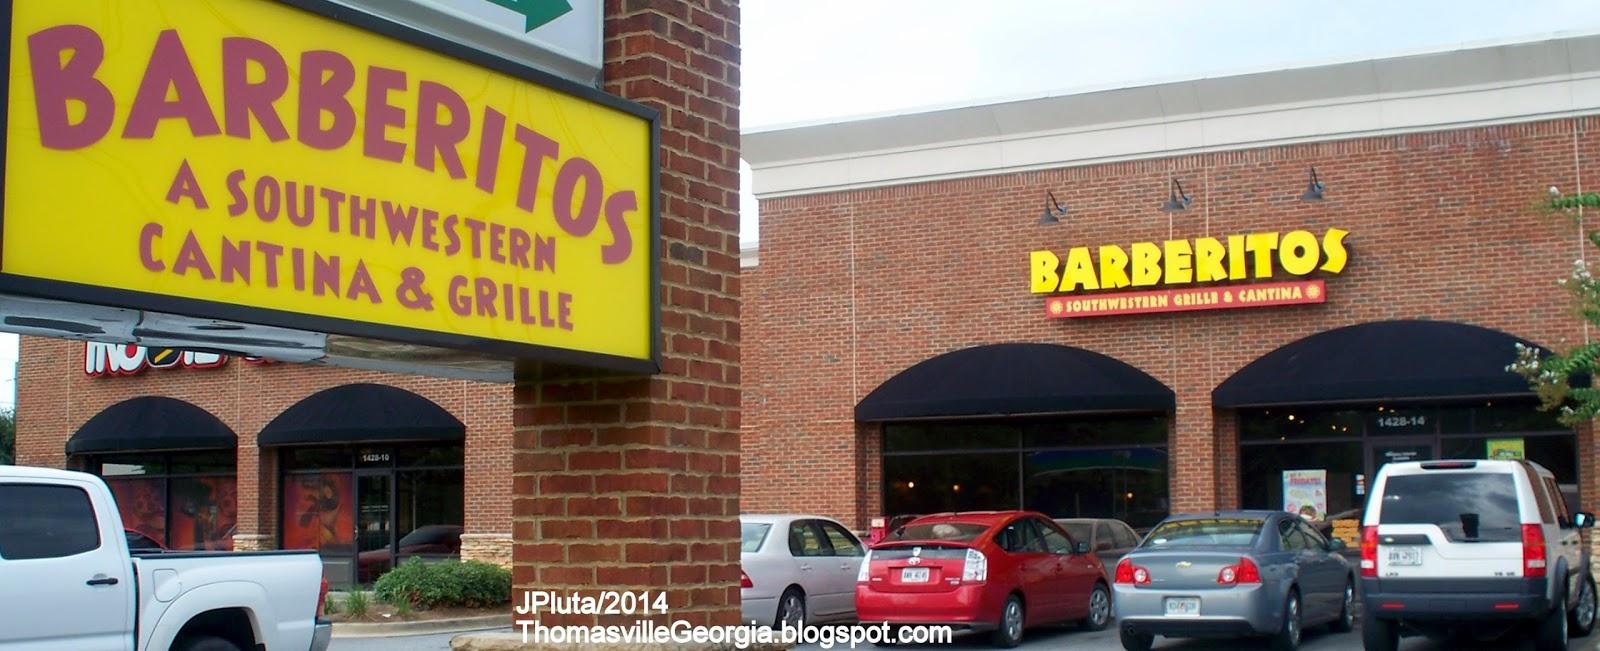 Barberitos : ... Barberitos Southwestern Cantina & Grille Restaurant BARBERITOS